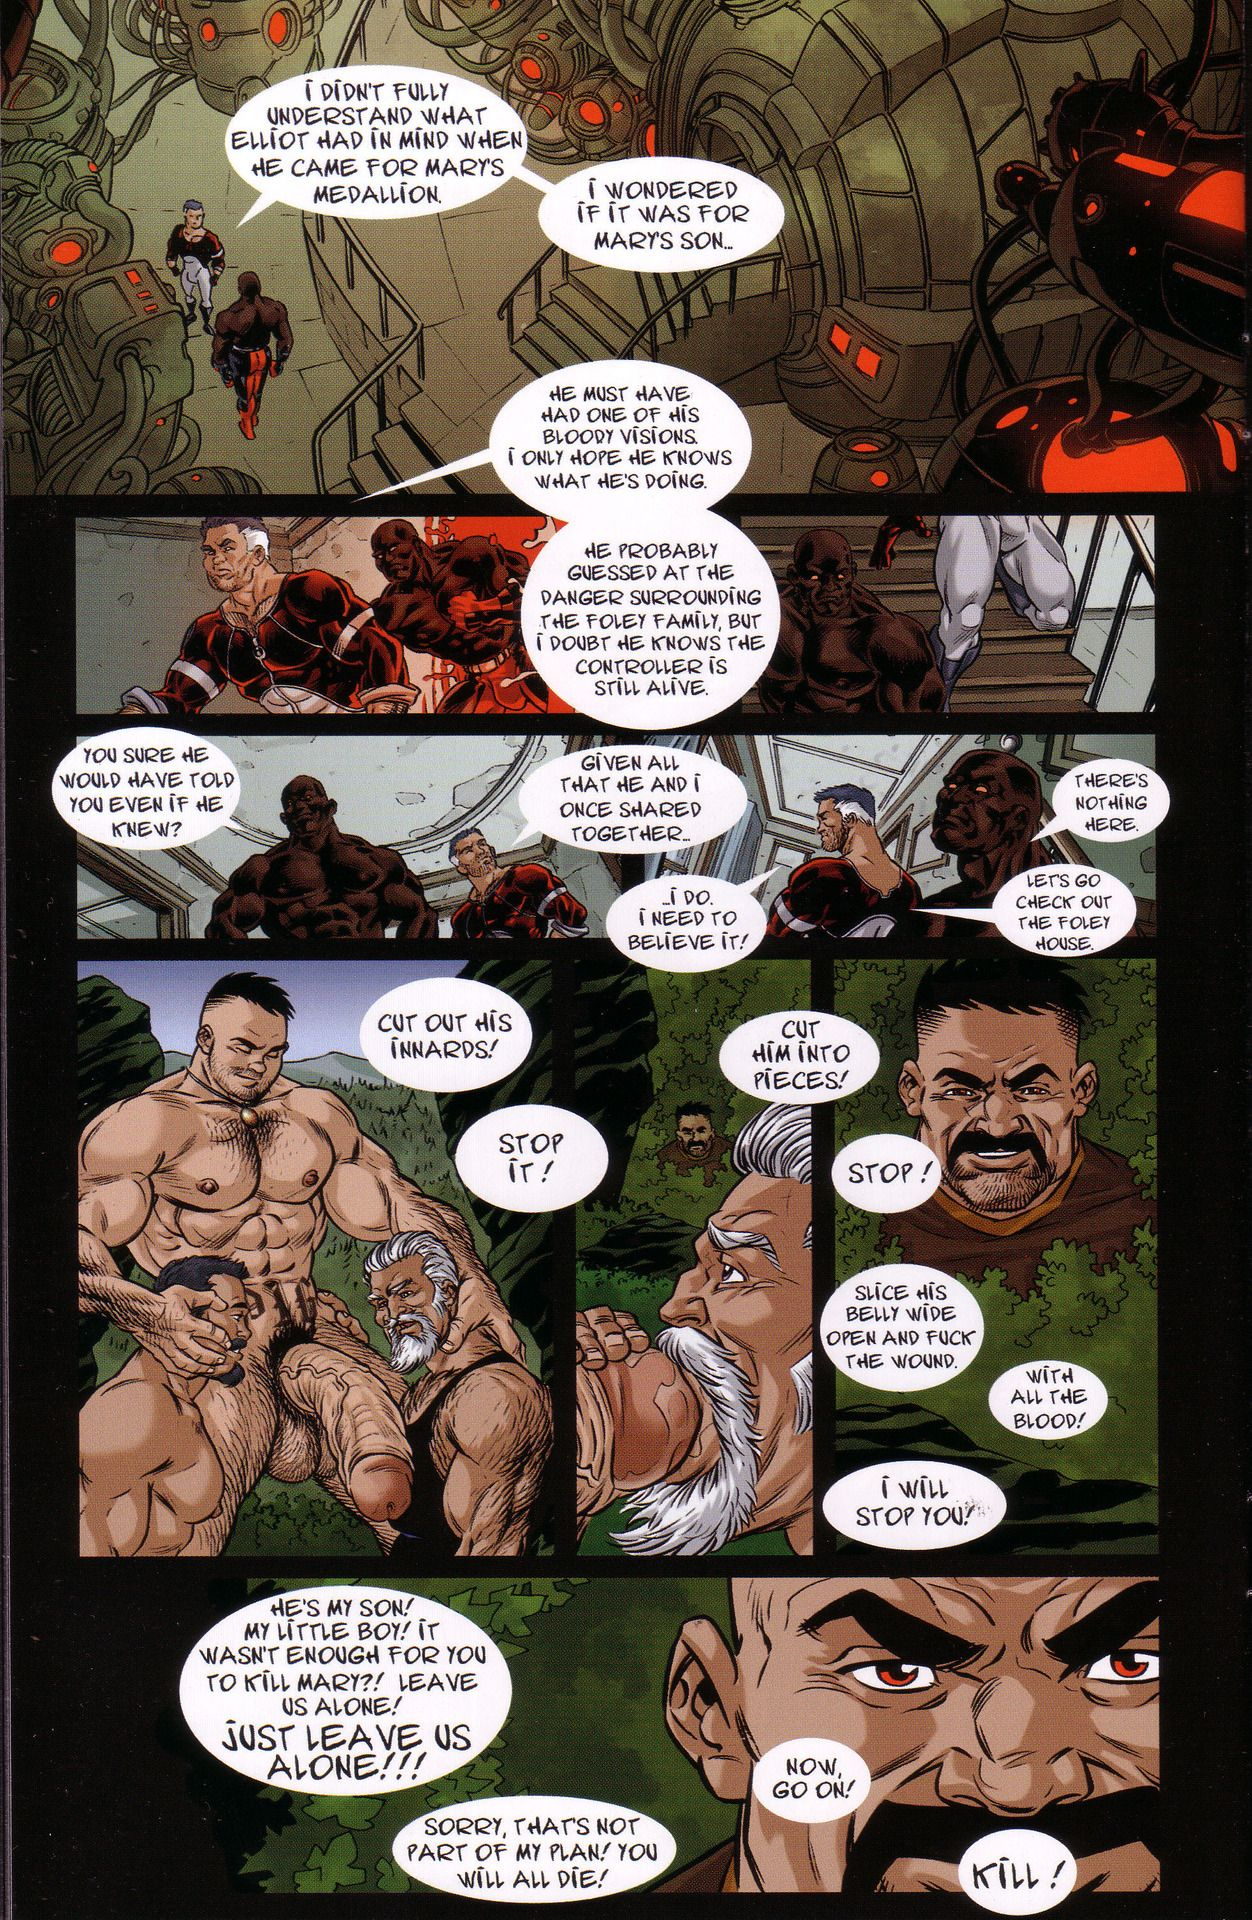 Porkey gay comics